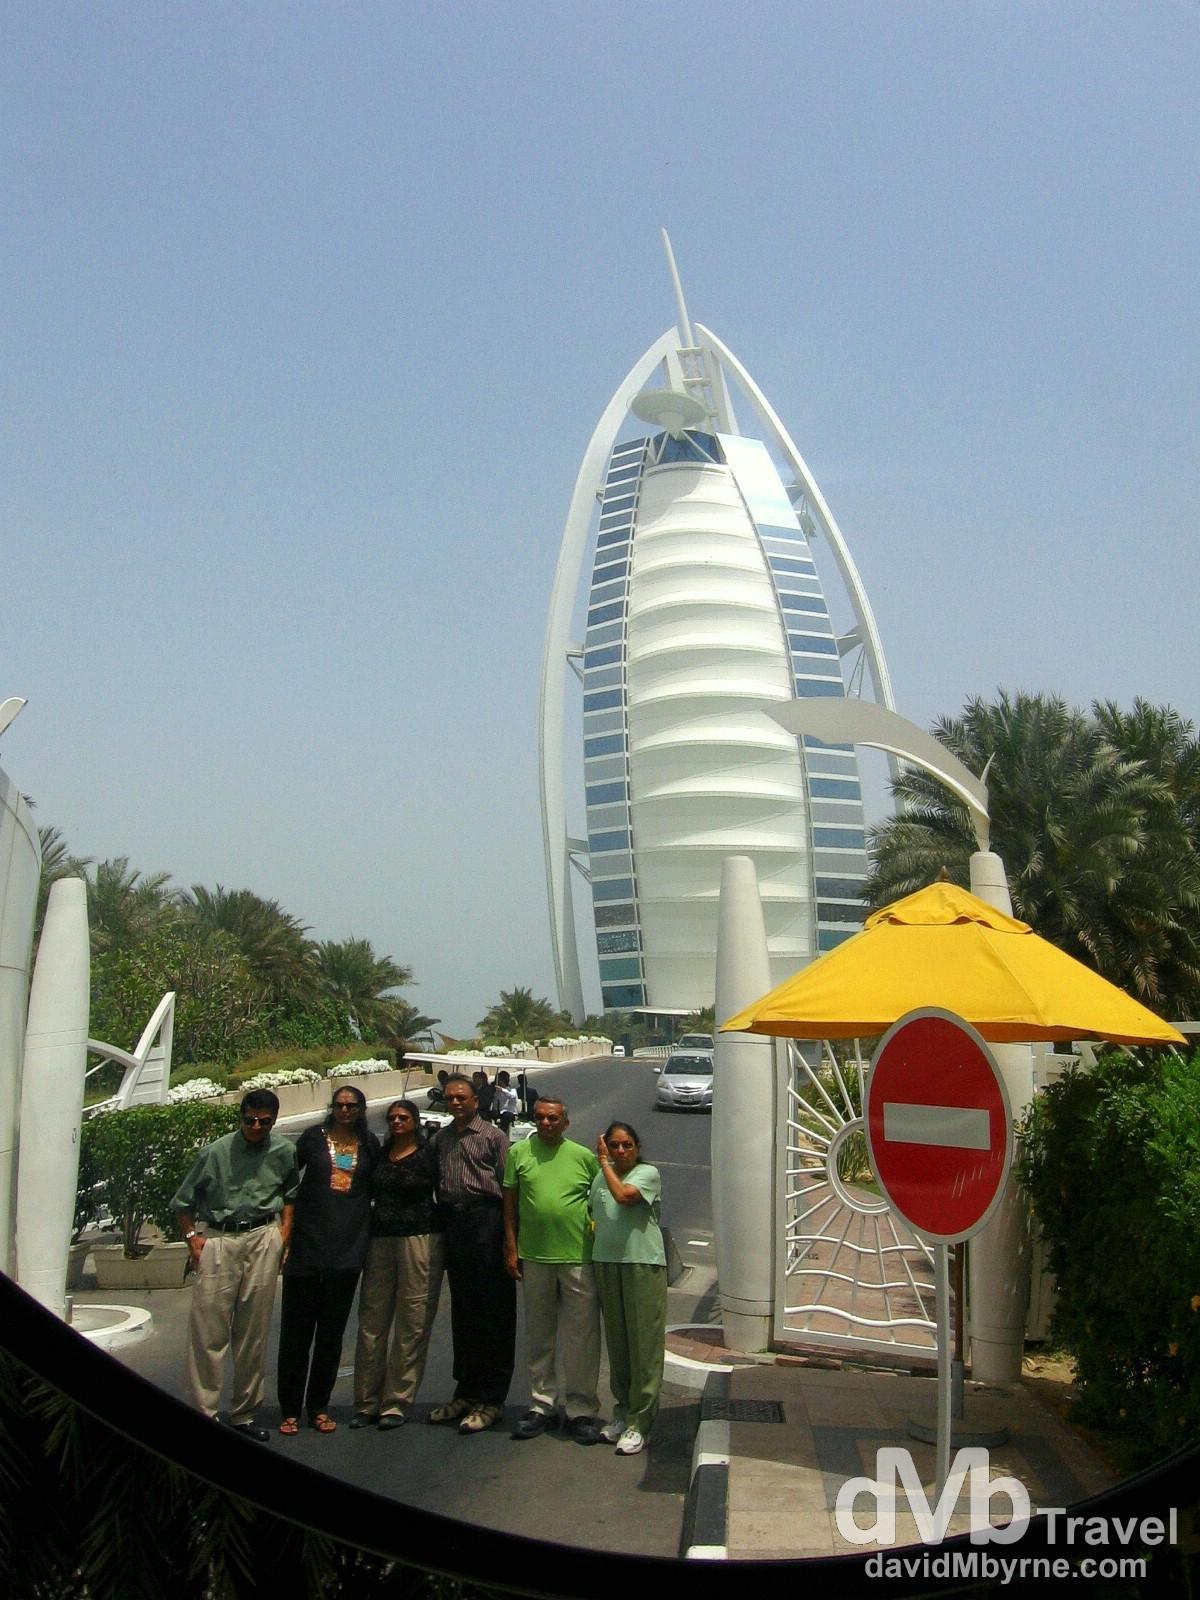 Burj Al Arab Hotel, Dubai, Unite Arab Emirates